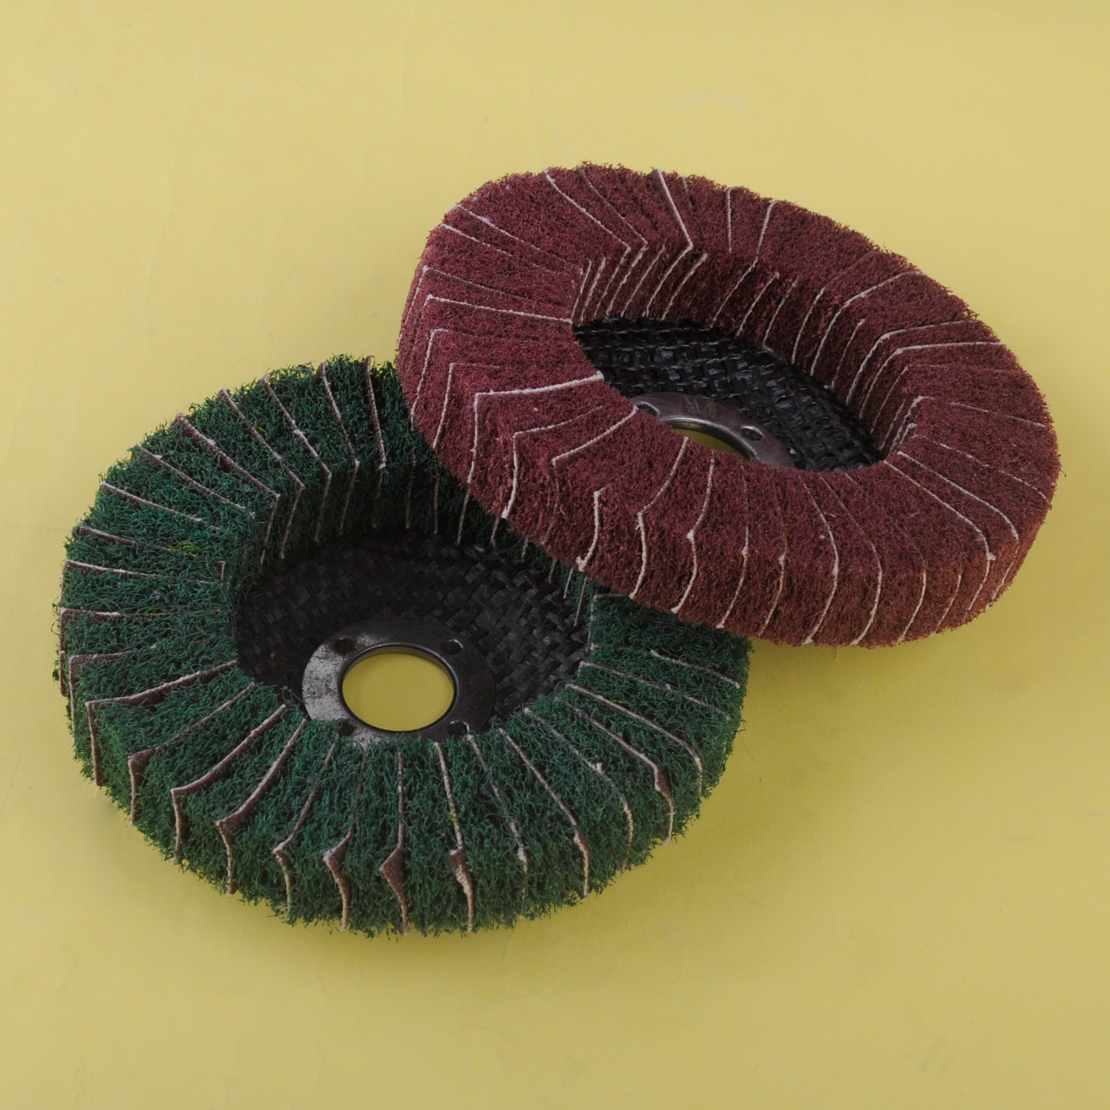 Nylon Abrasive Polishing Buffing Fiber Flap Wheel Disc Dia 100mm Grit 120 Or 240